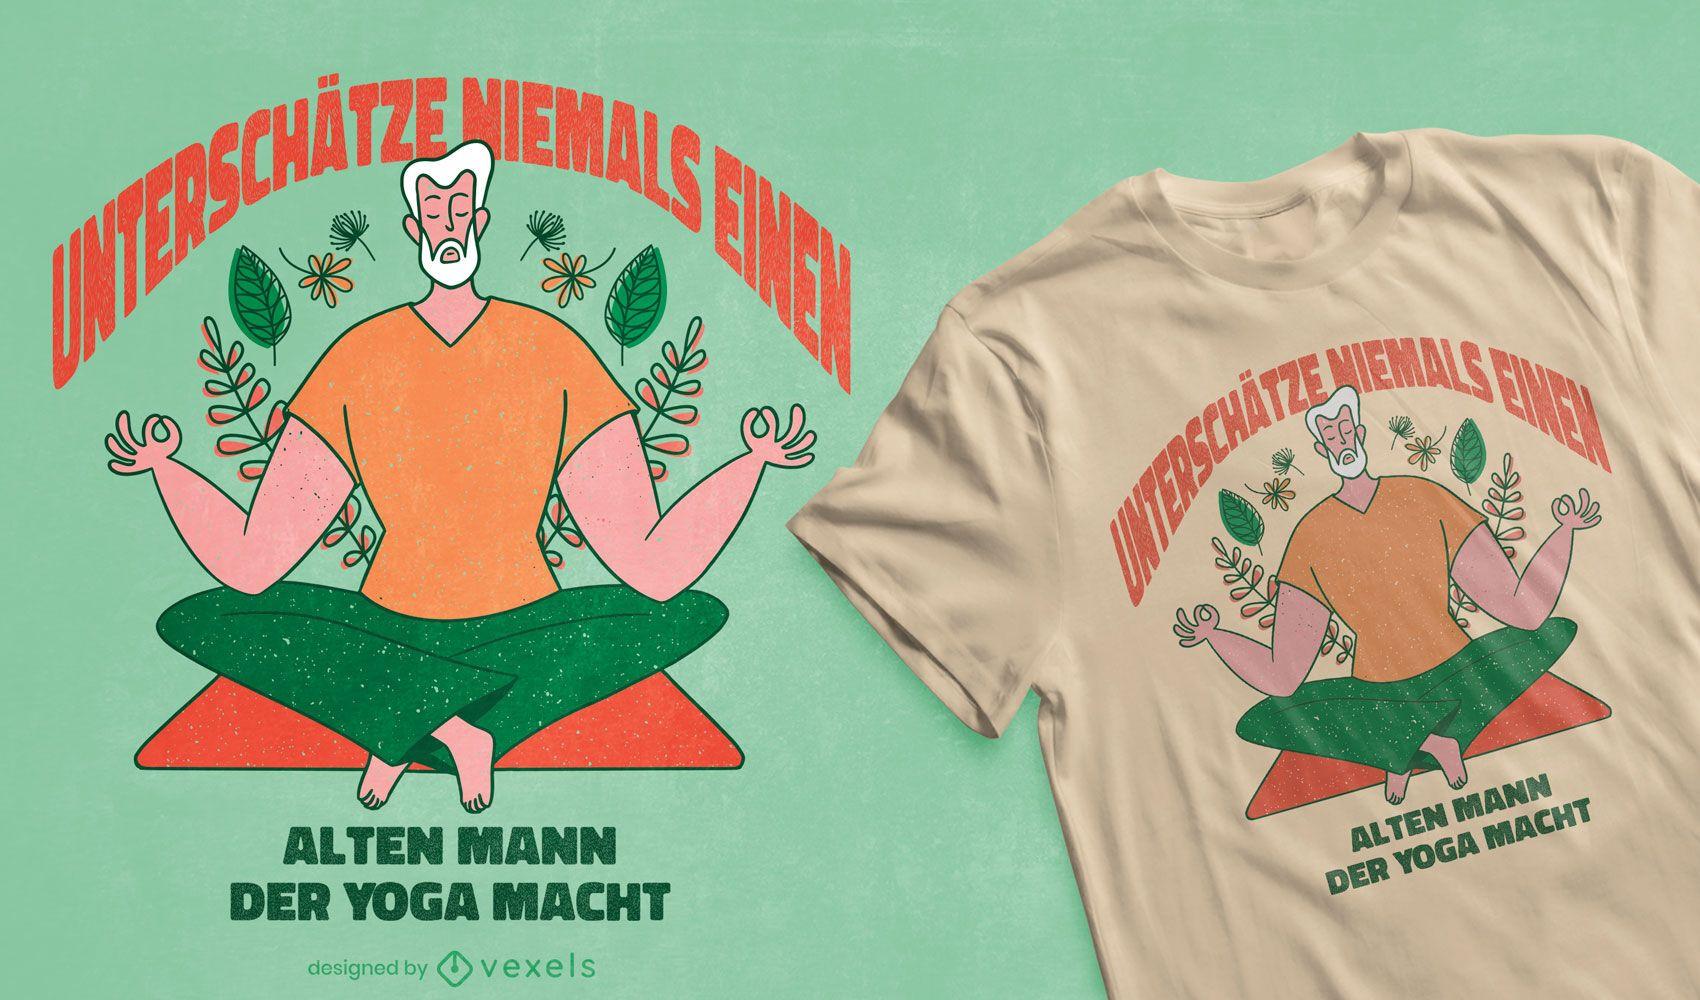 Old man yoga t-shirt design